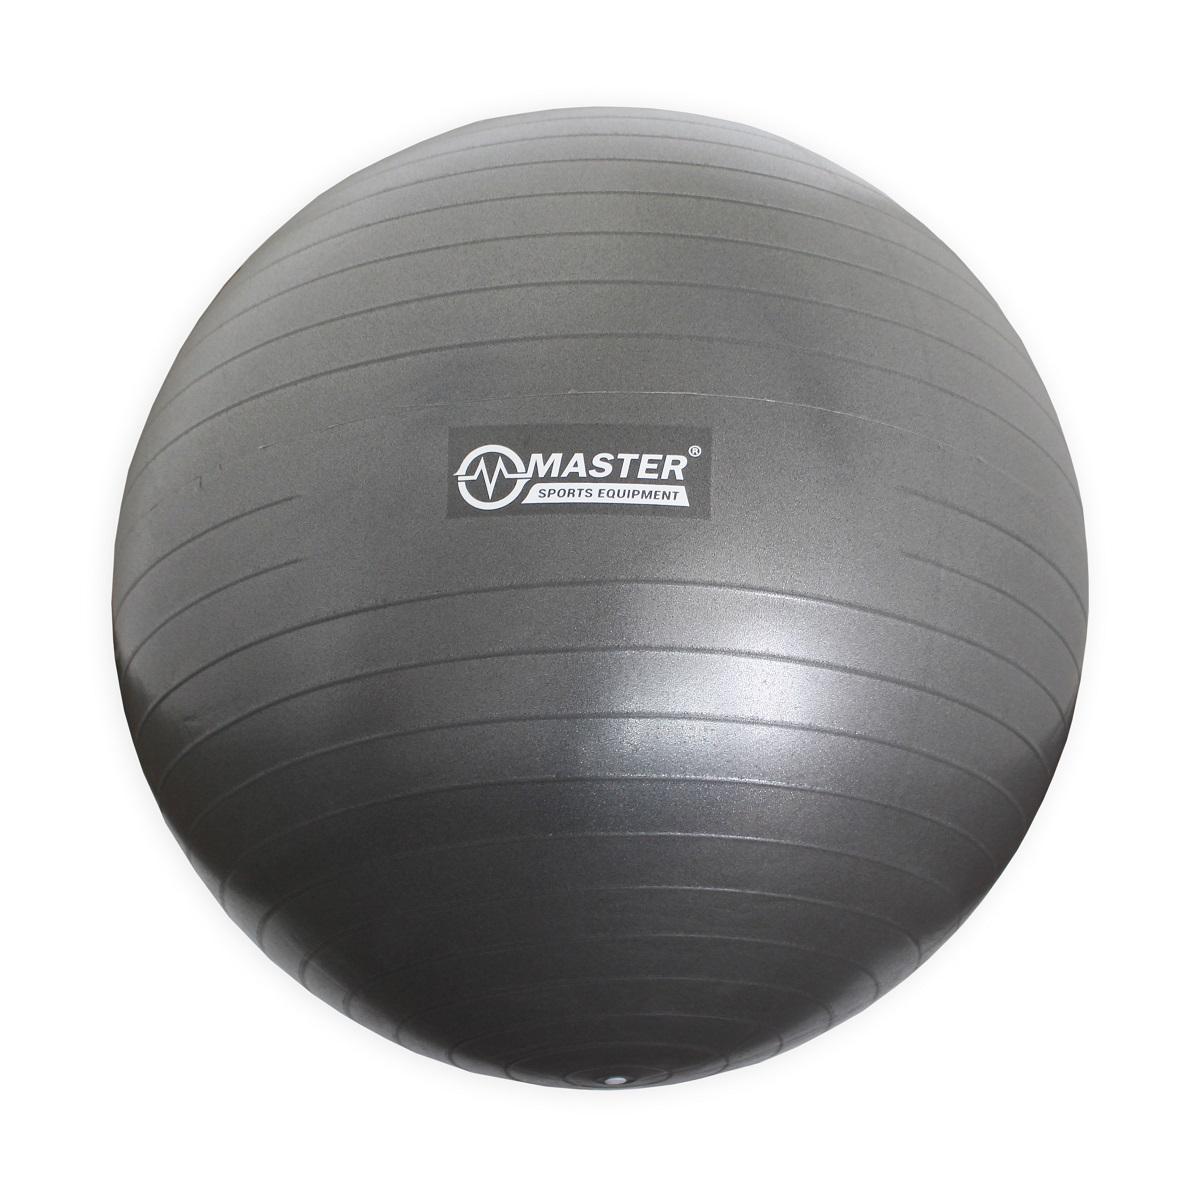 MASTER Super Ball - 65 cm